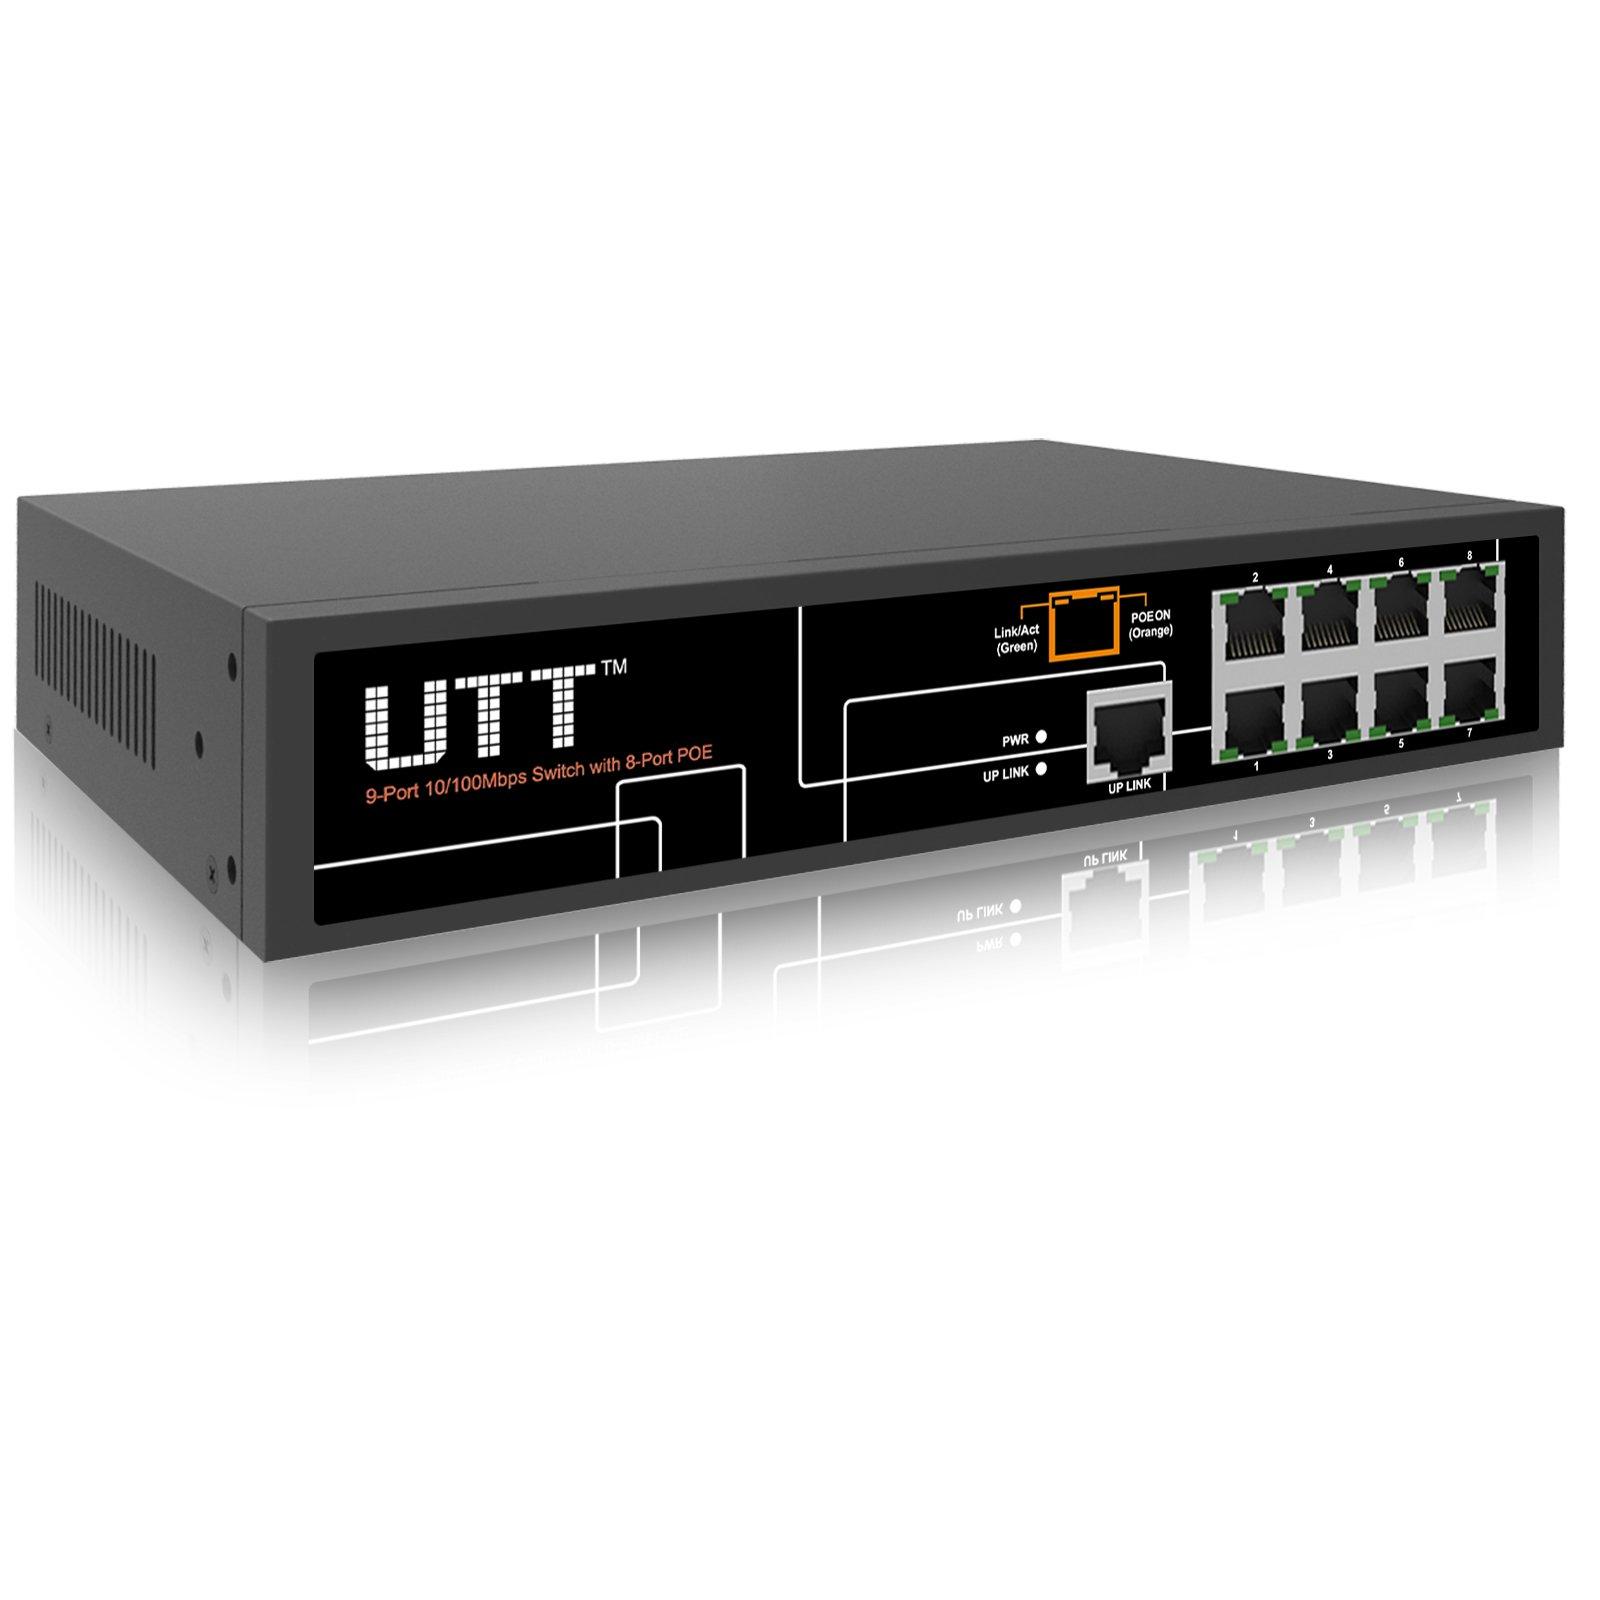 UTT S1081P Internet Unmanaged PoE Switch with (8 PoE Ports | 1 Ethernet Uplink Port) – 120W– 802.3af – for IP Camera & AP by UTT